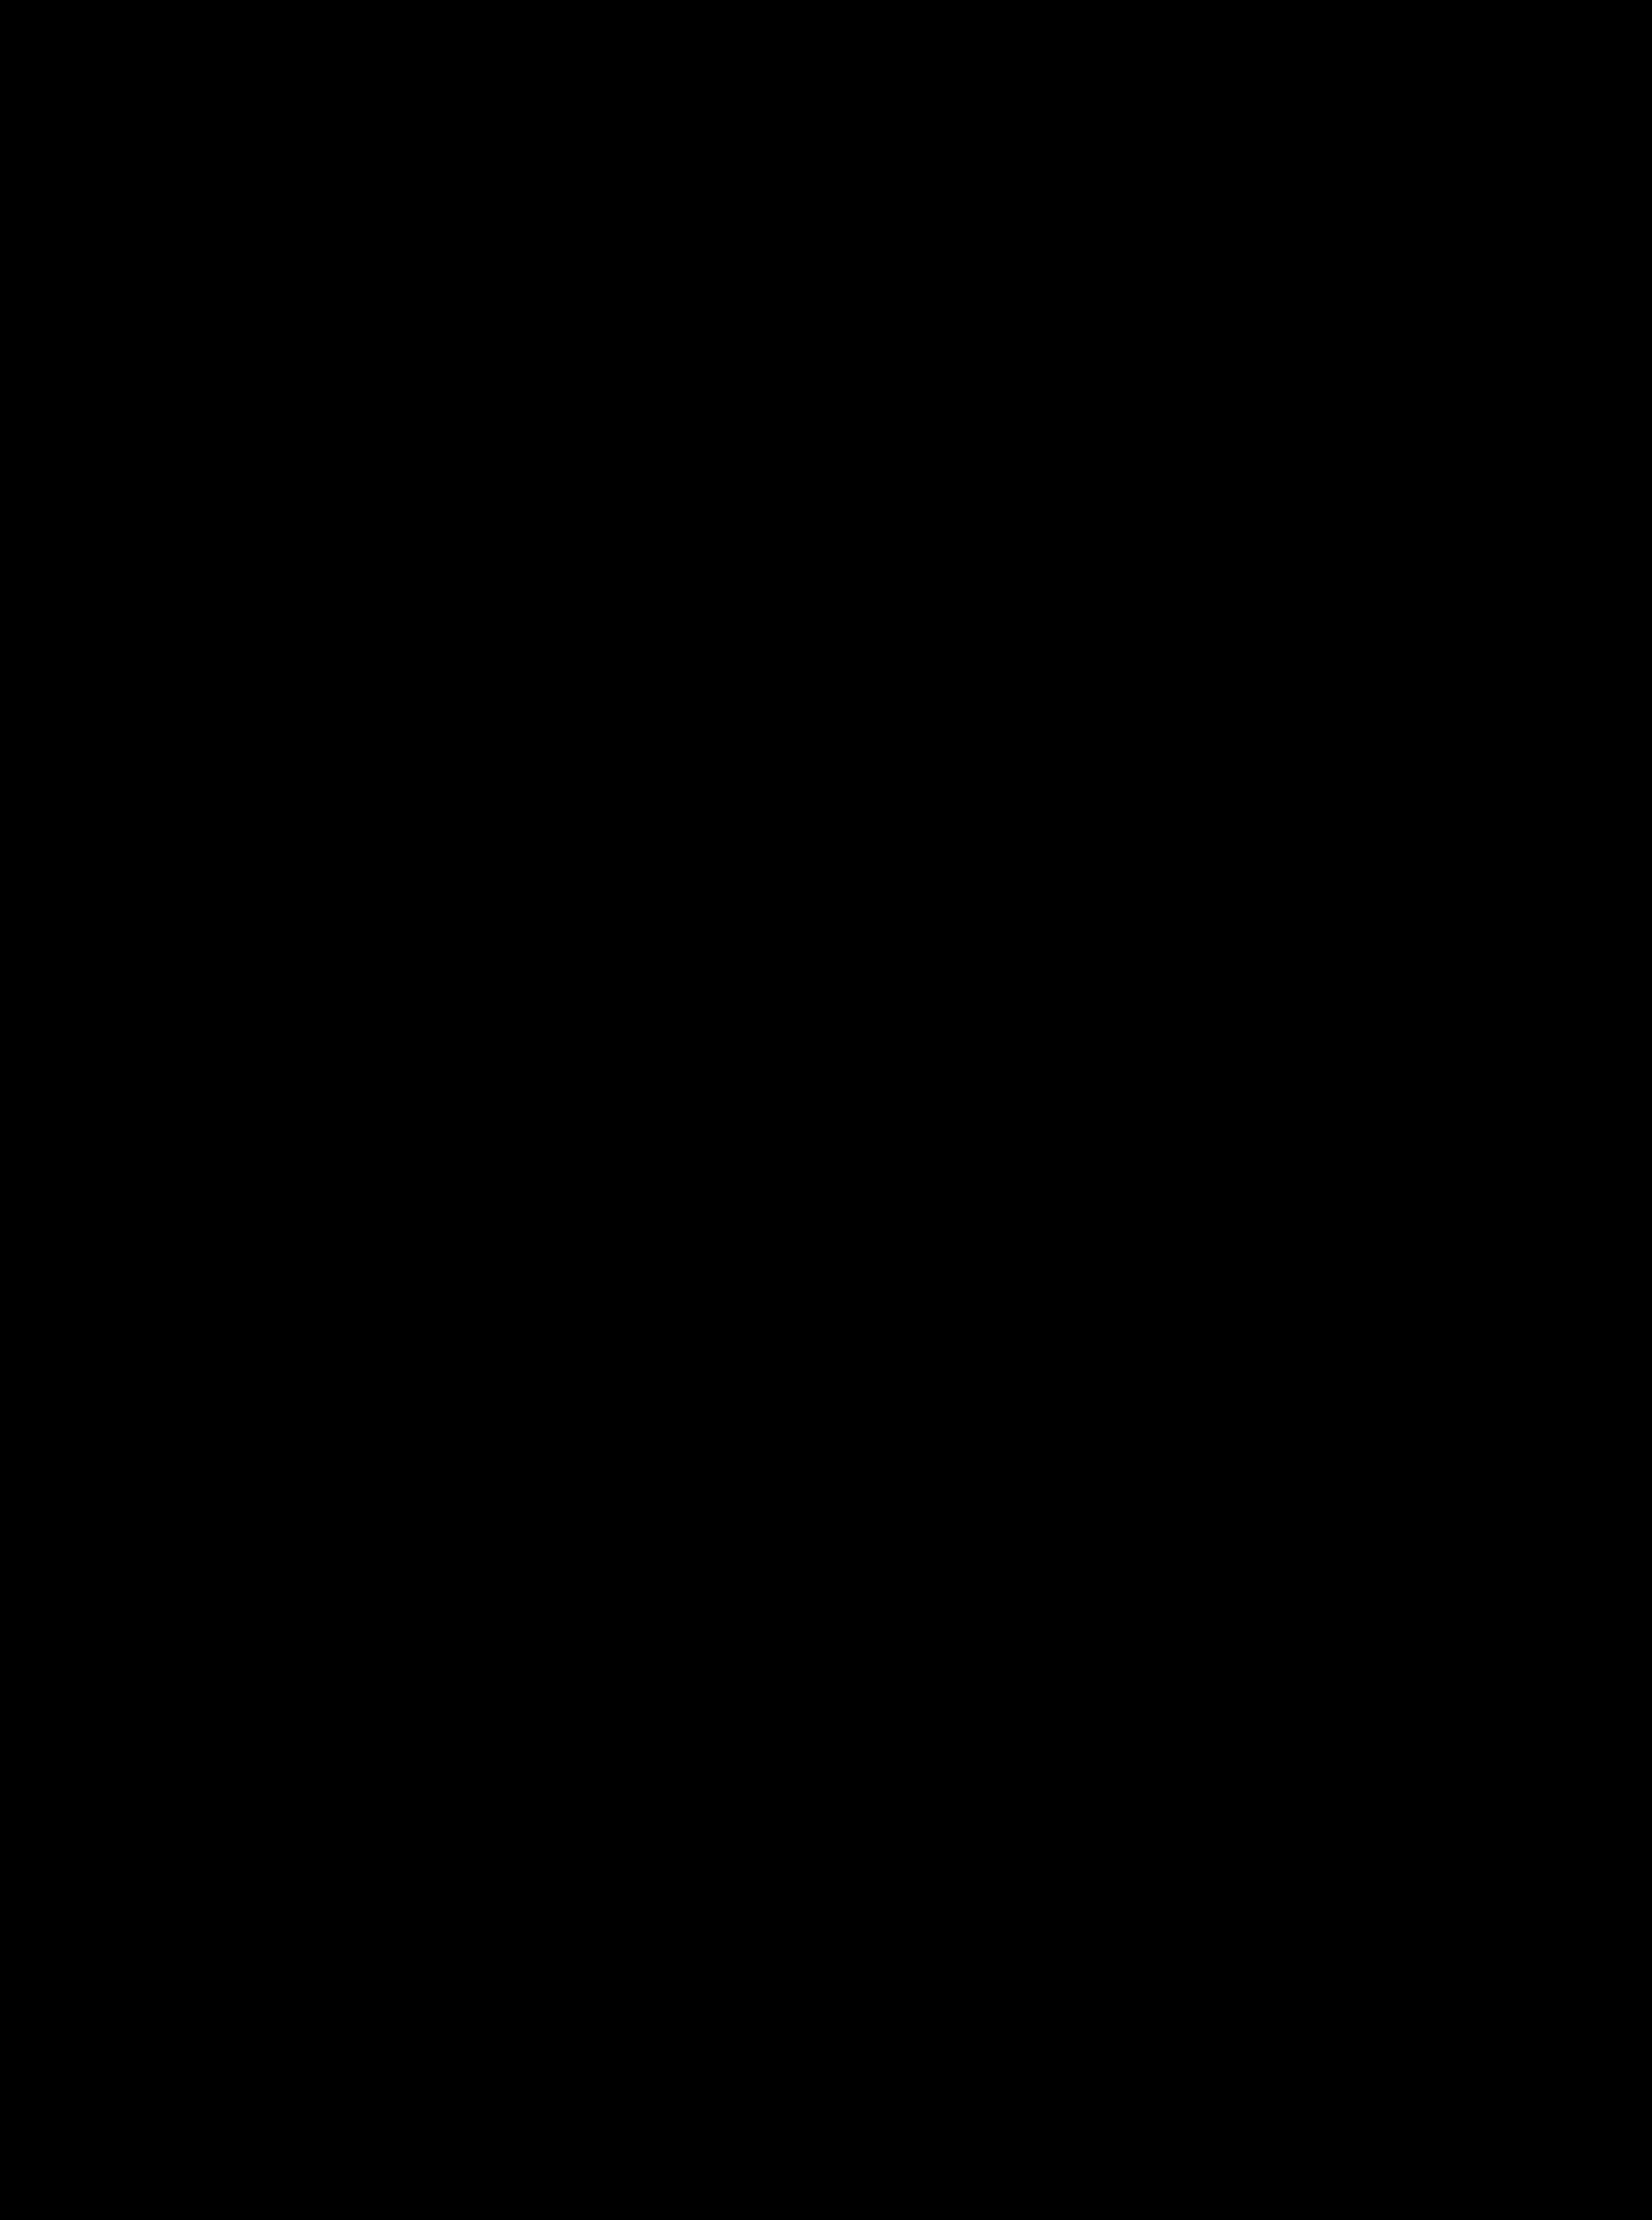 Image Of Clip Art Bulb 6 Light Bulb Icon Clipart Free - Light Bulb Silhouette Png (1786x2400)